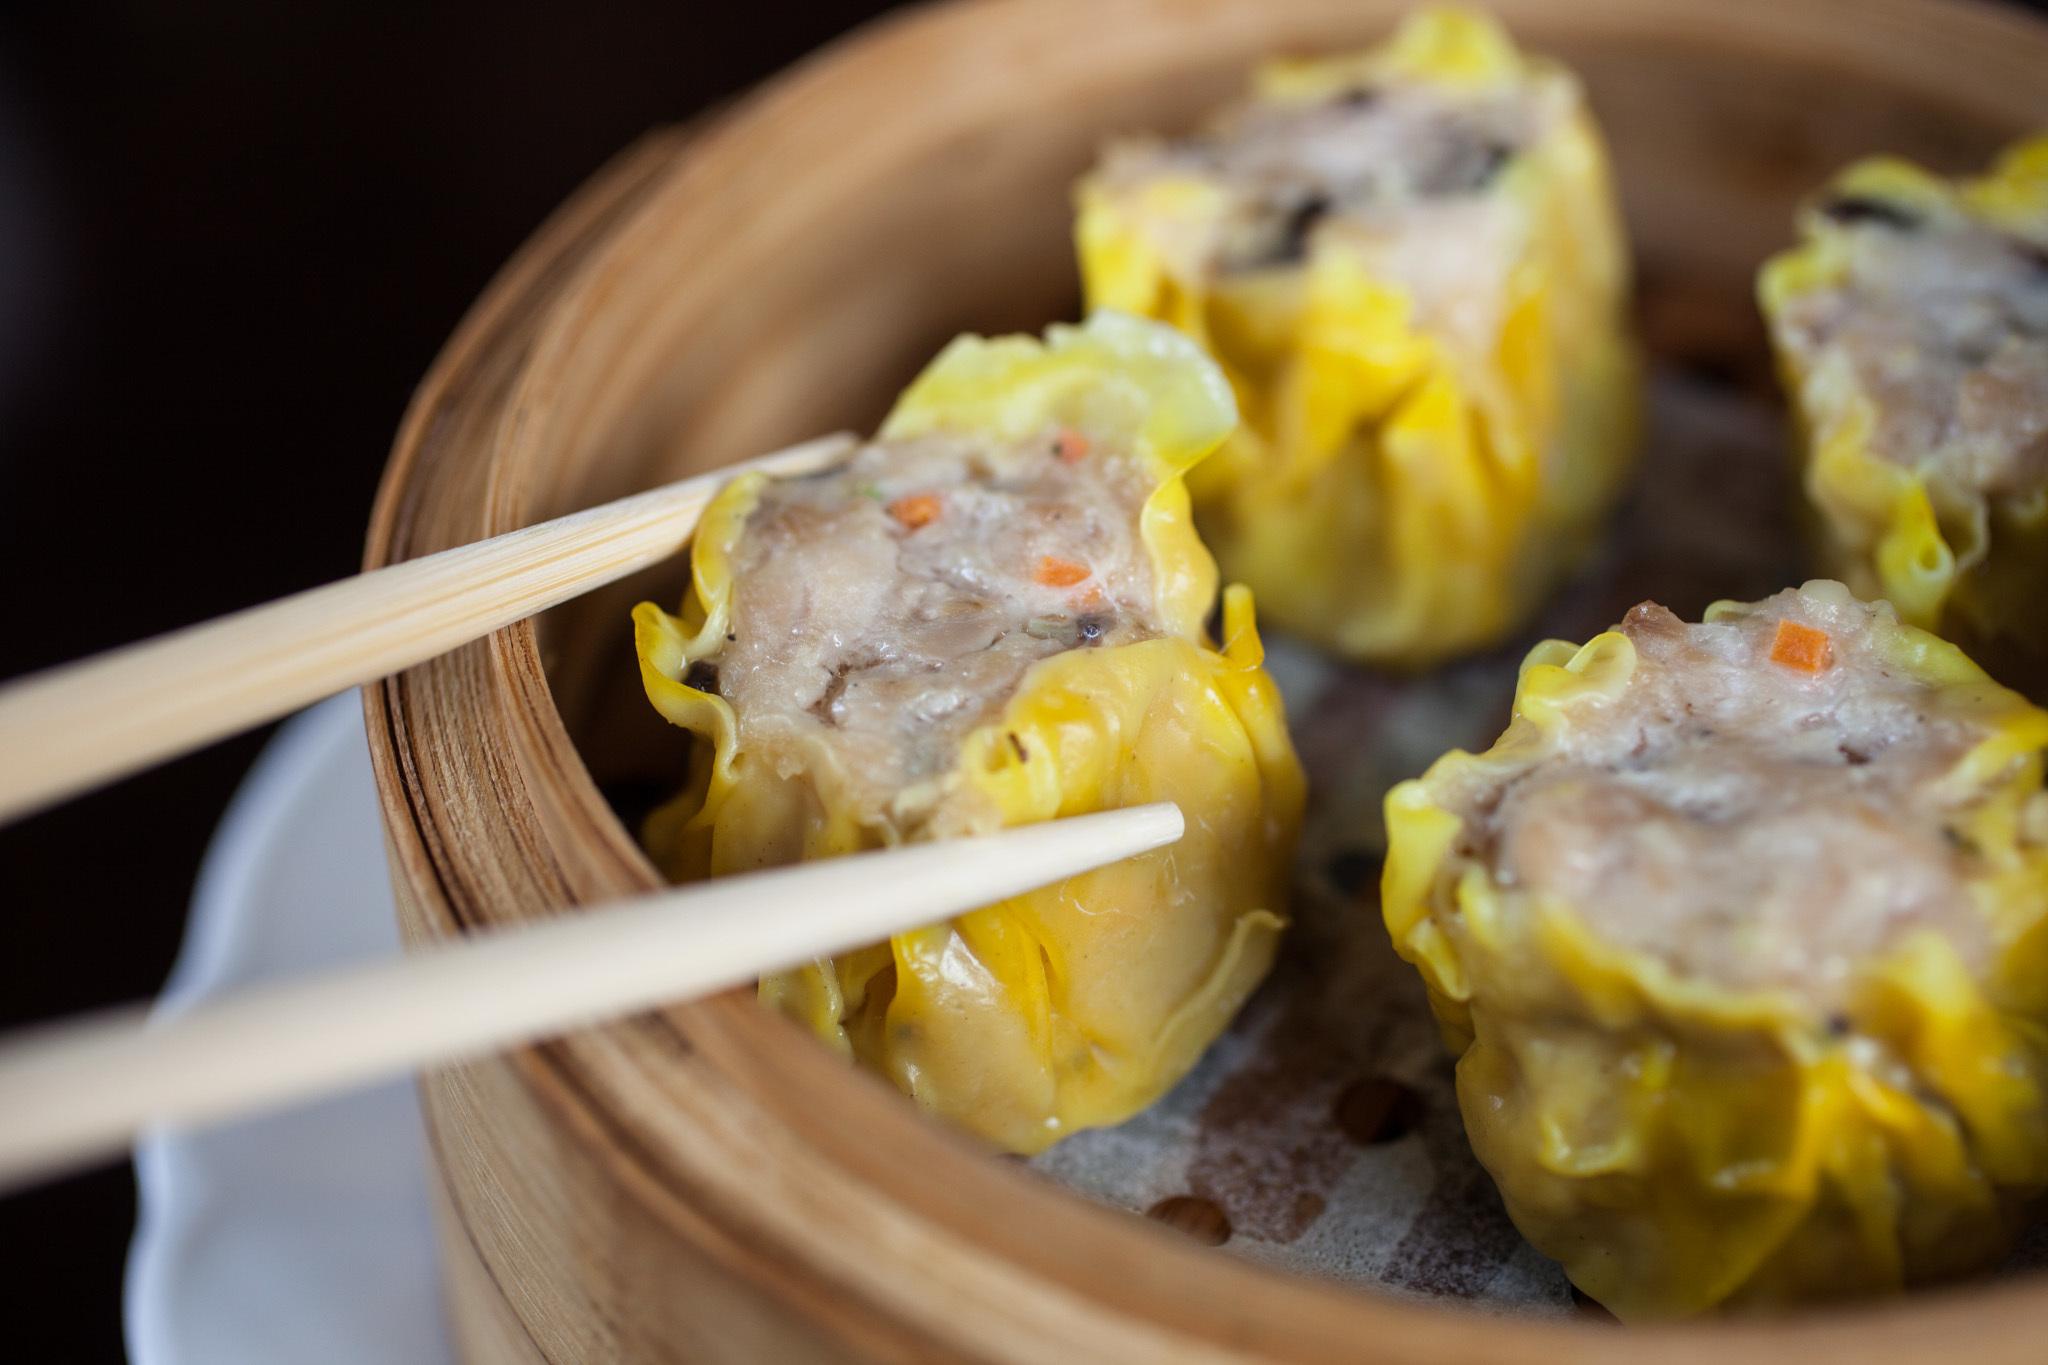 Chicken and mushroom sui mai at Yum Cha Dim Sum Parlor.